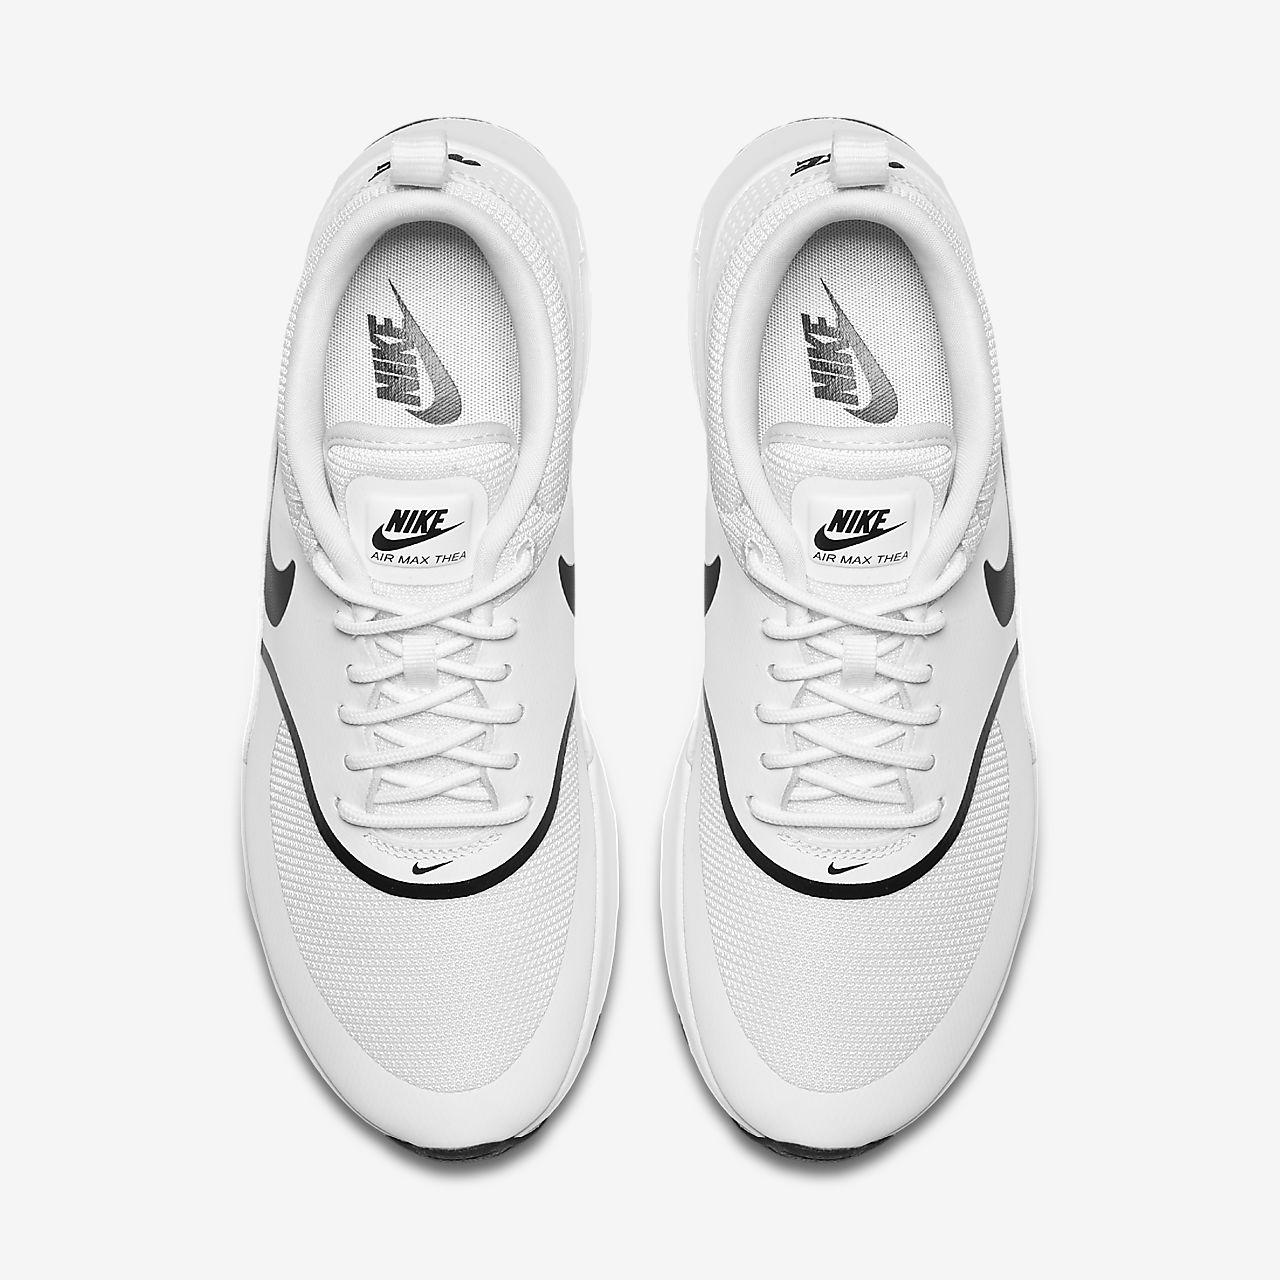 4cf1b94e52 Calzado para mujer Nike Air Max Thea. Nike.com MX